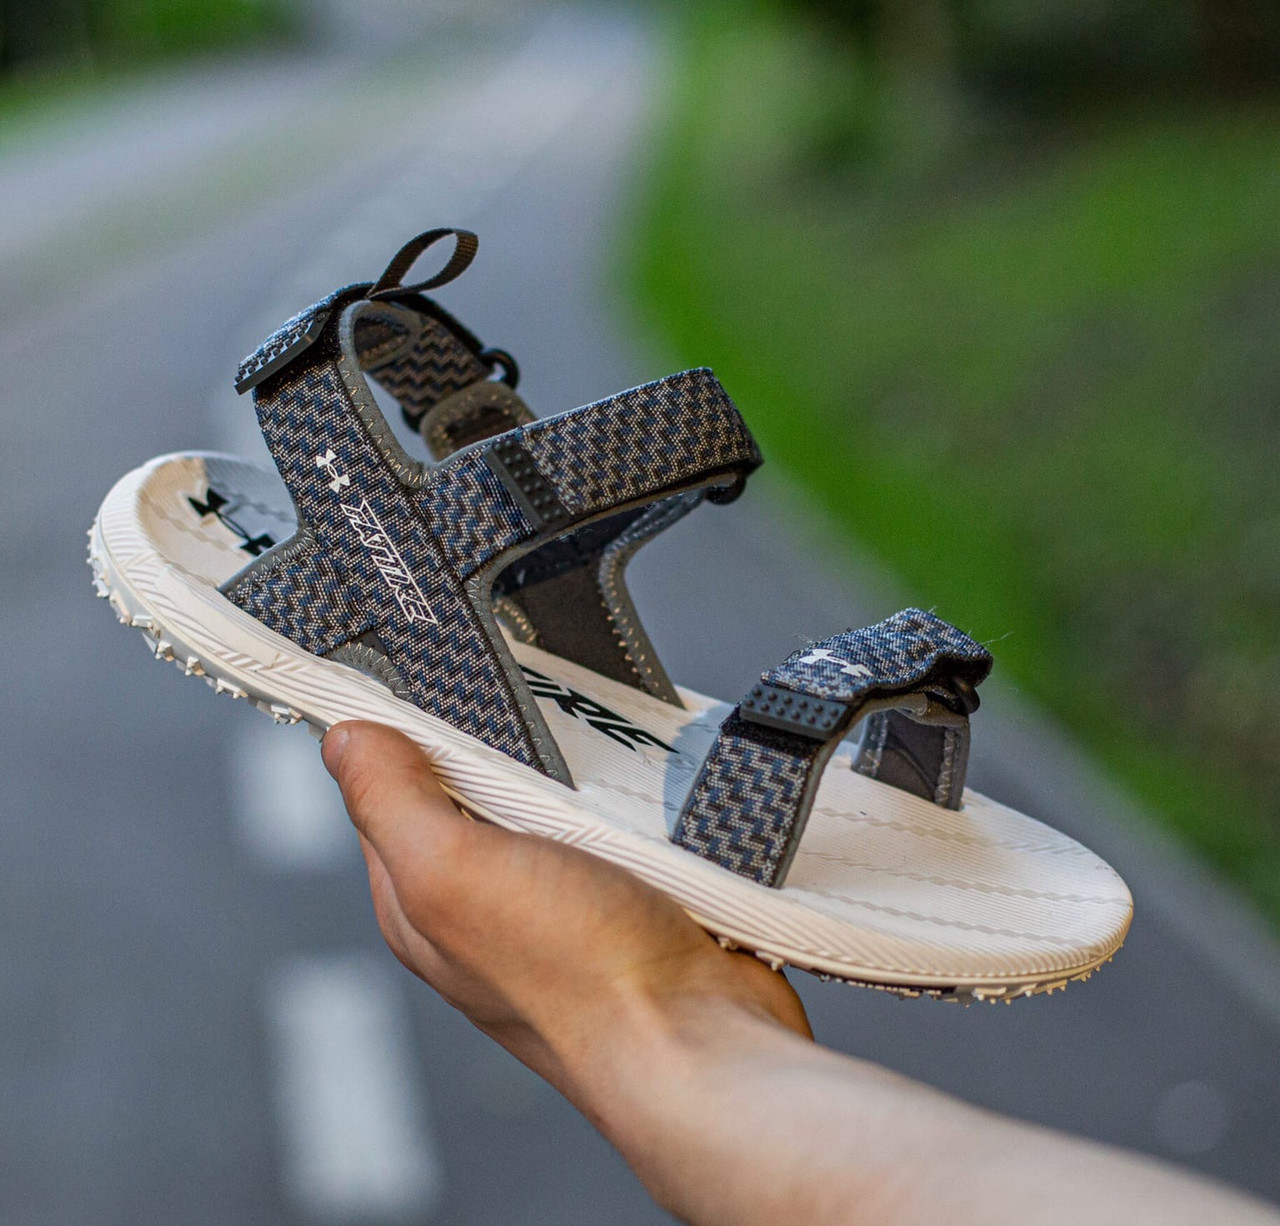 Мужские сандалии Under Armour Fattire Sandala x Michelin, Реплика